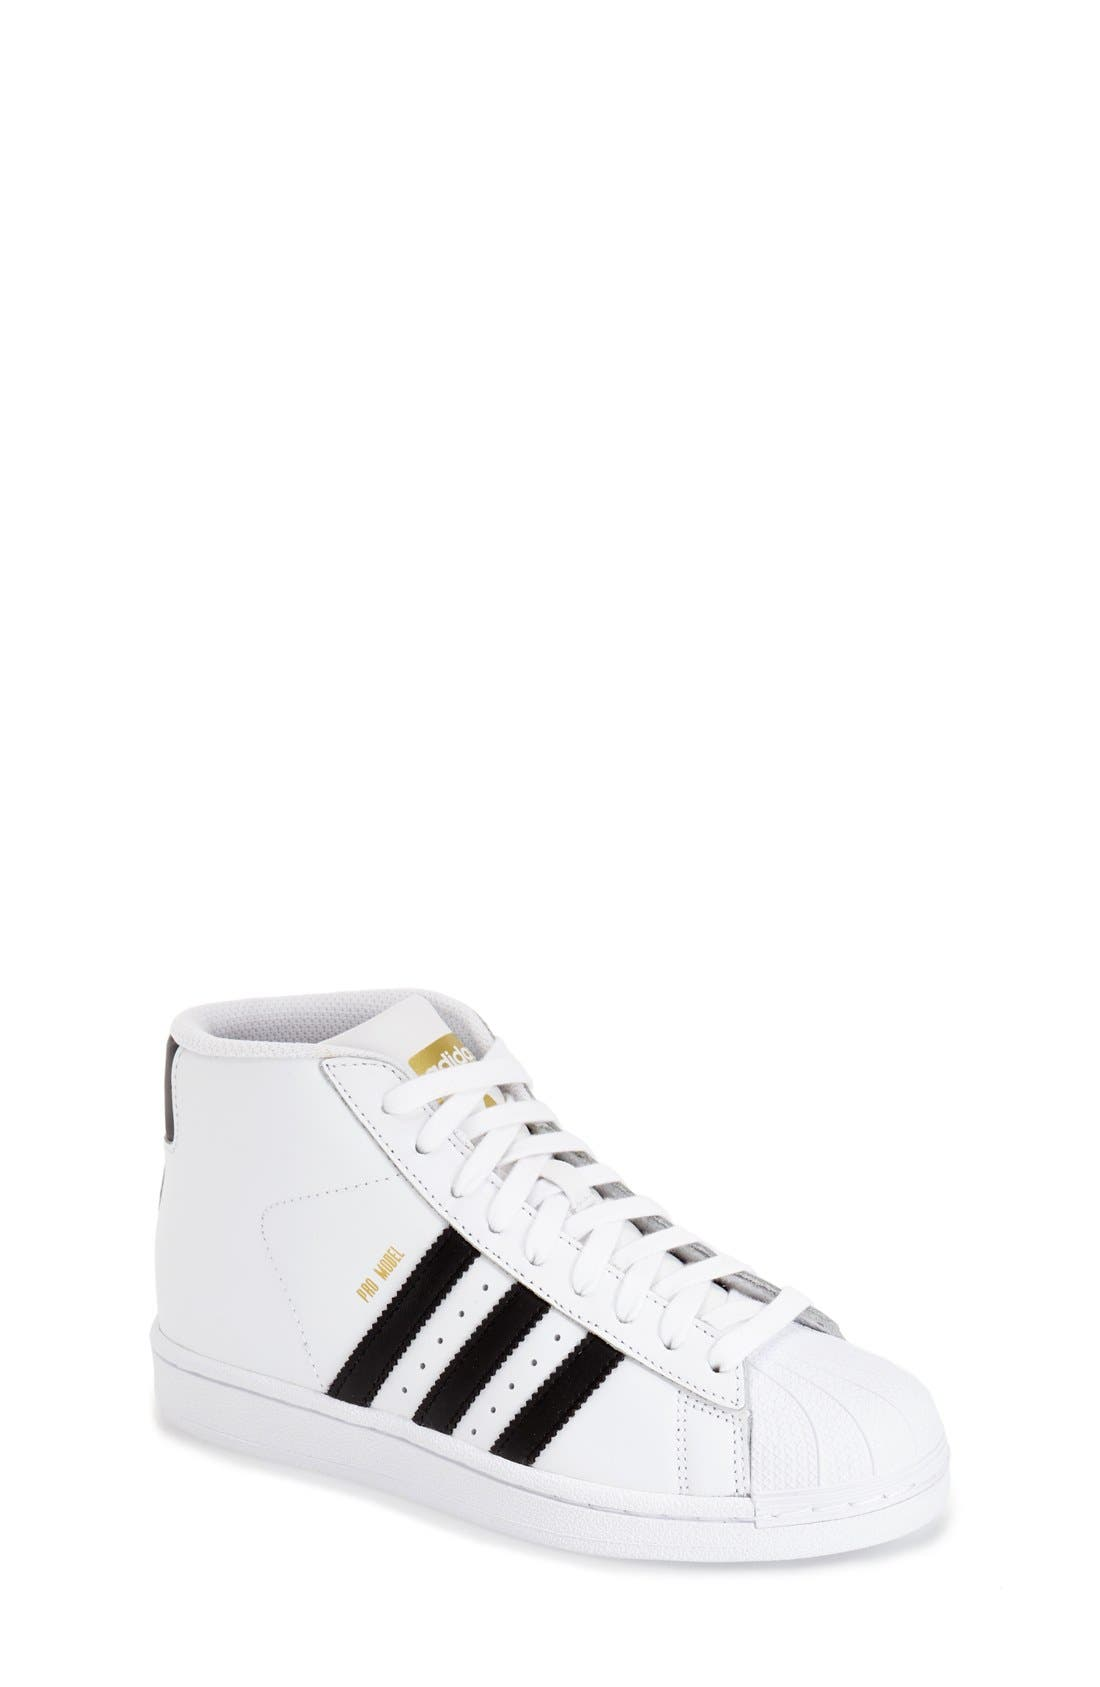 adidas 'Pro Model' High Top Sneaker (Big Kid)